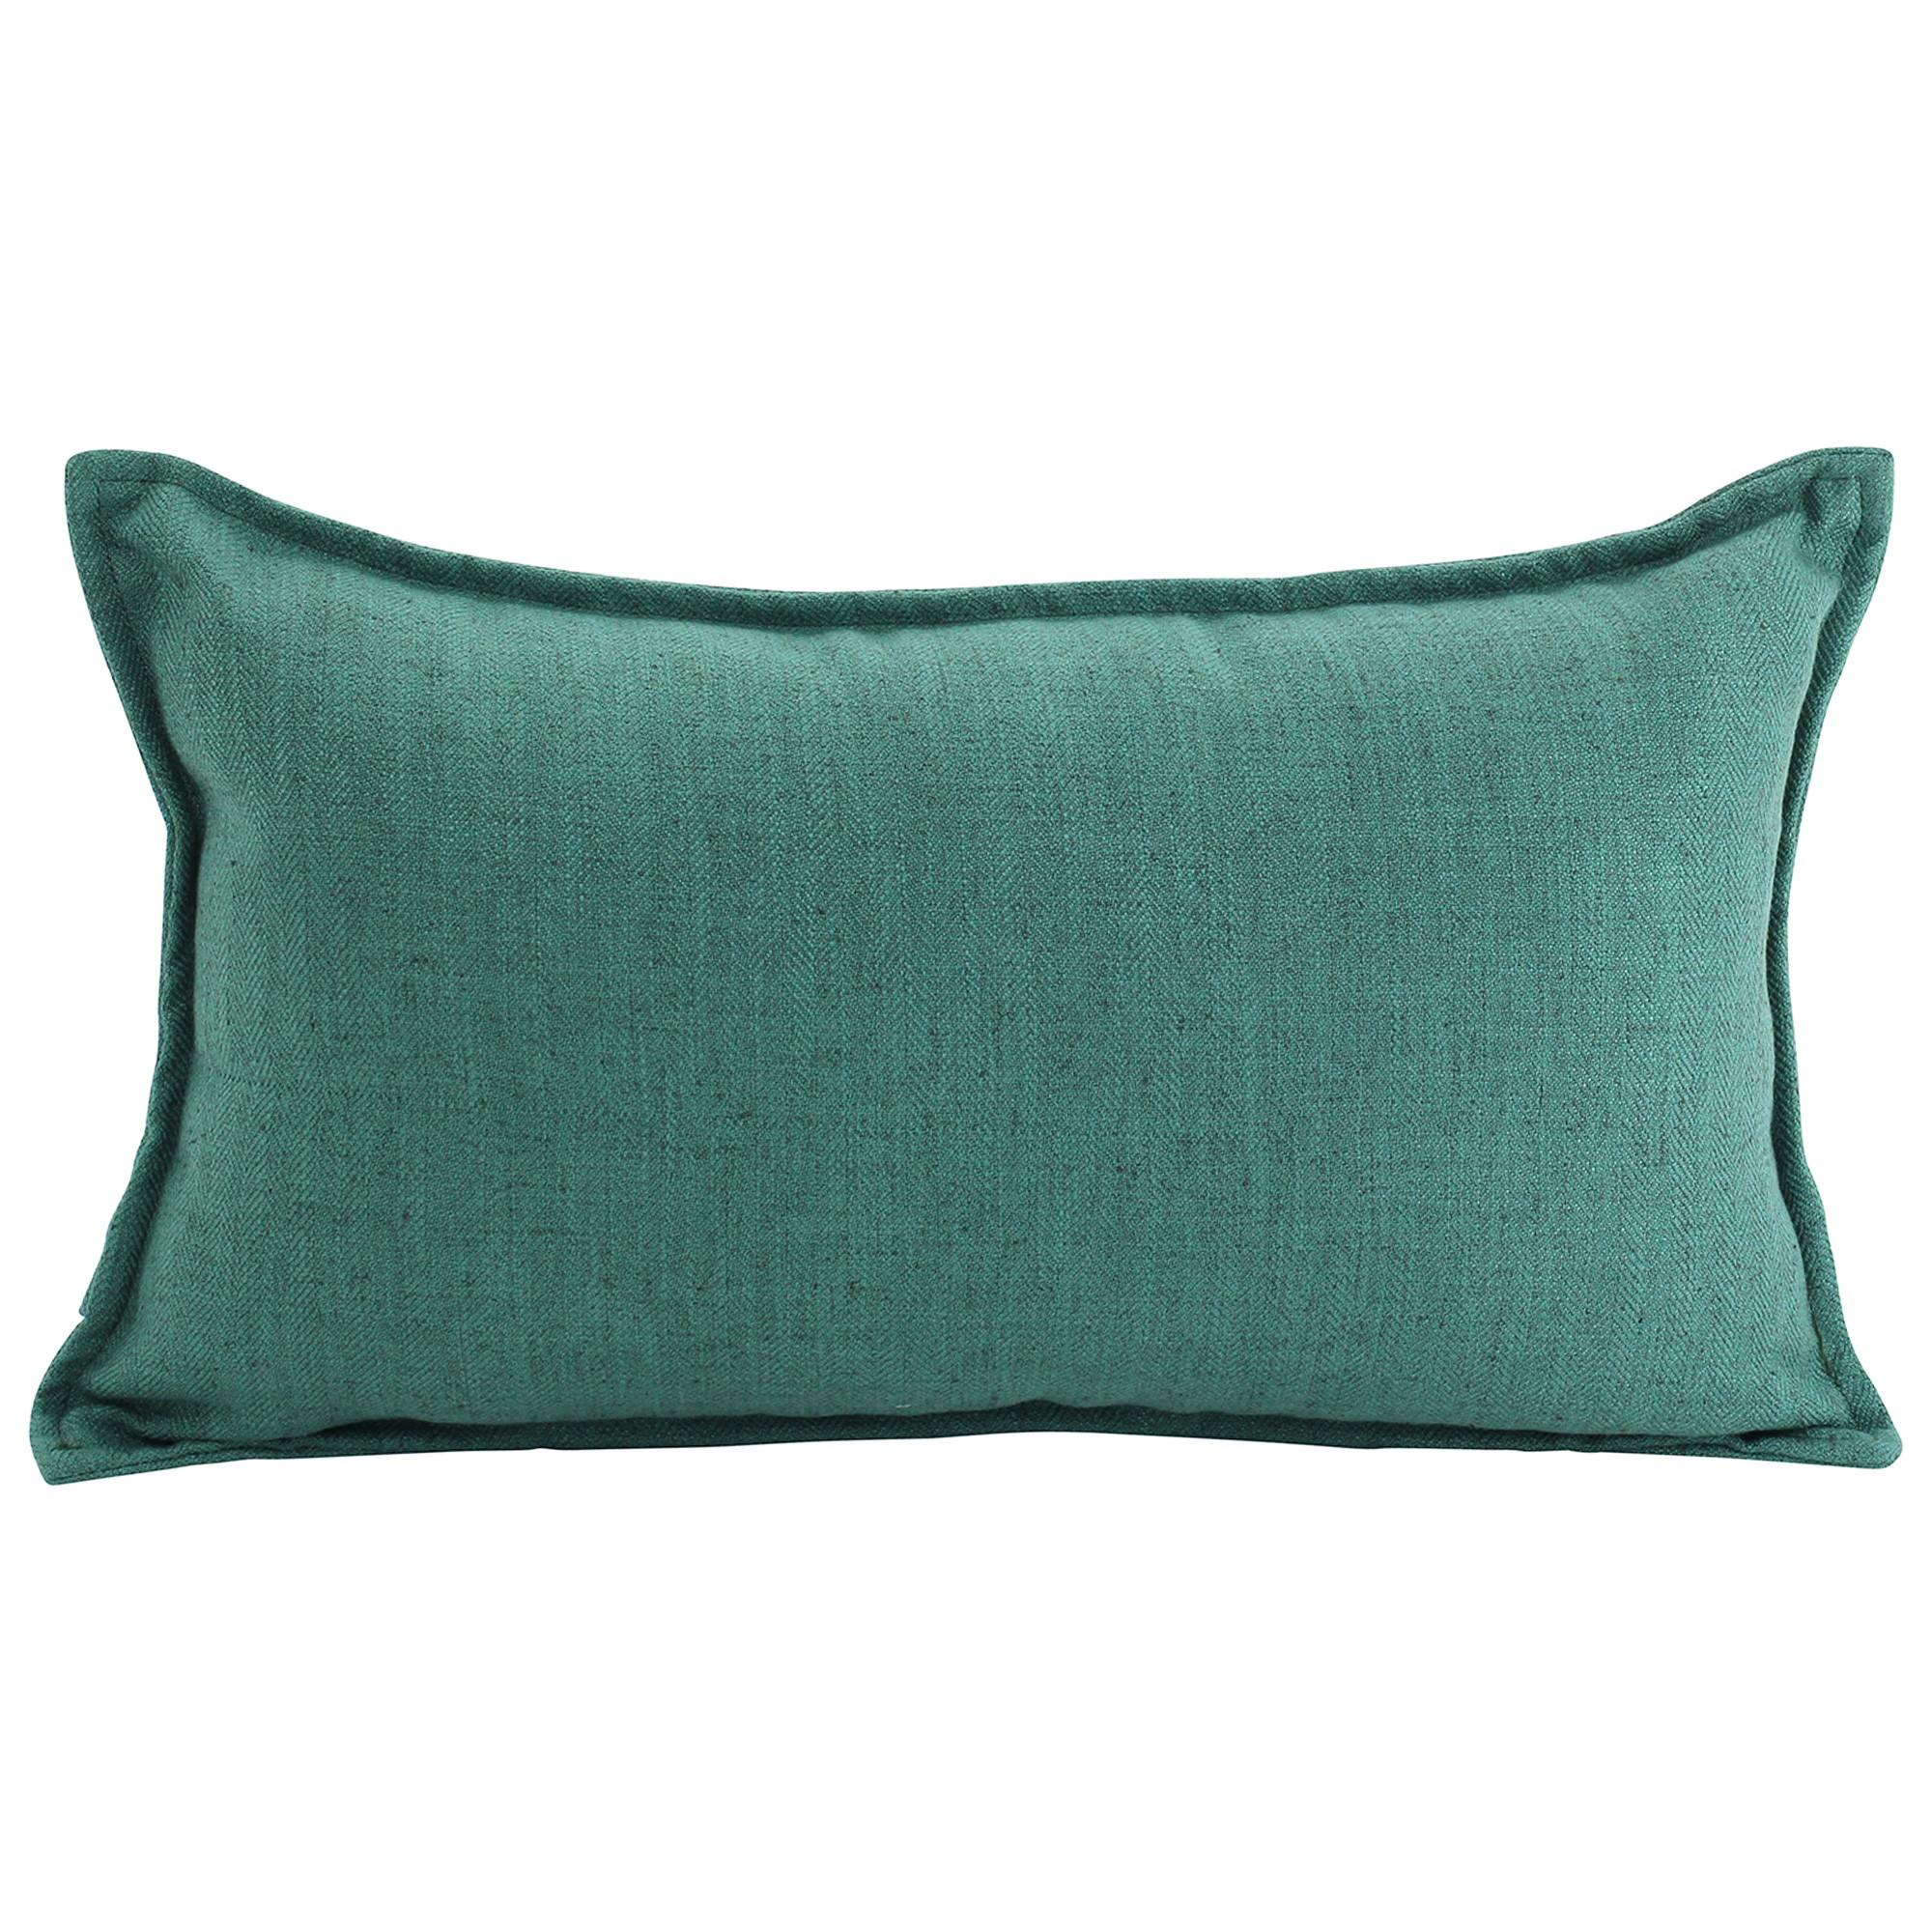 Farra Linen Lumbar Cushion, Green